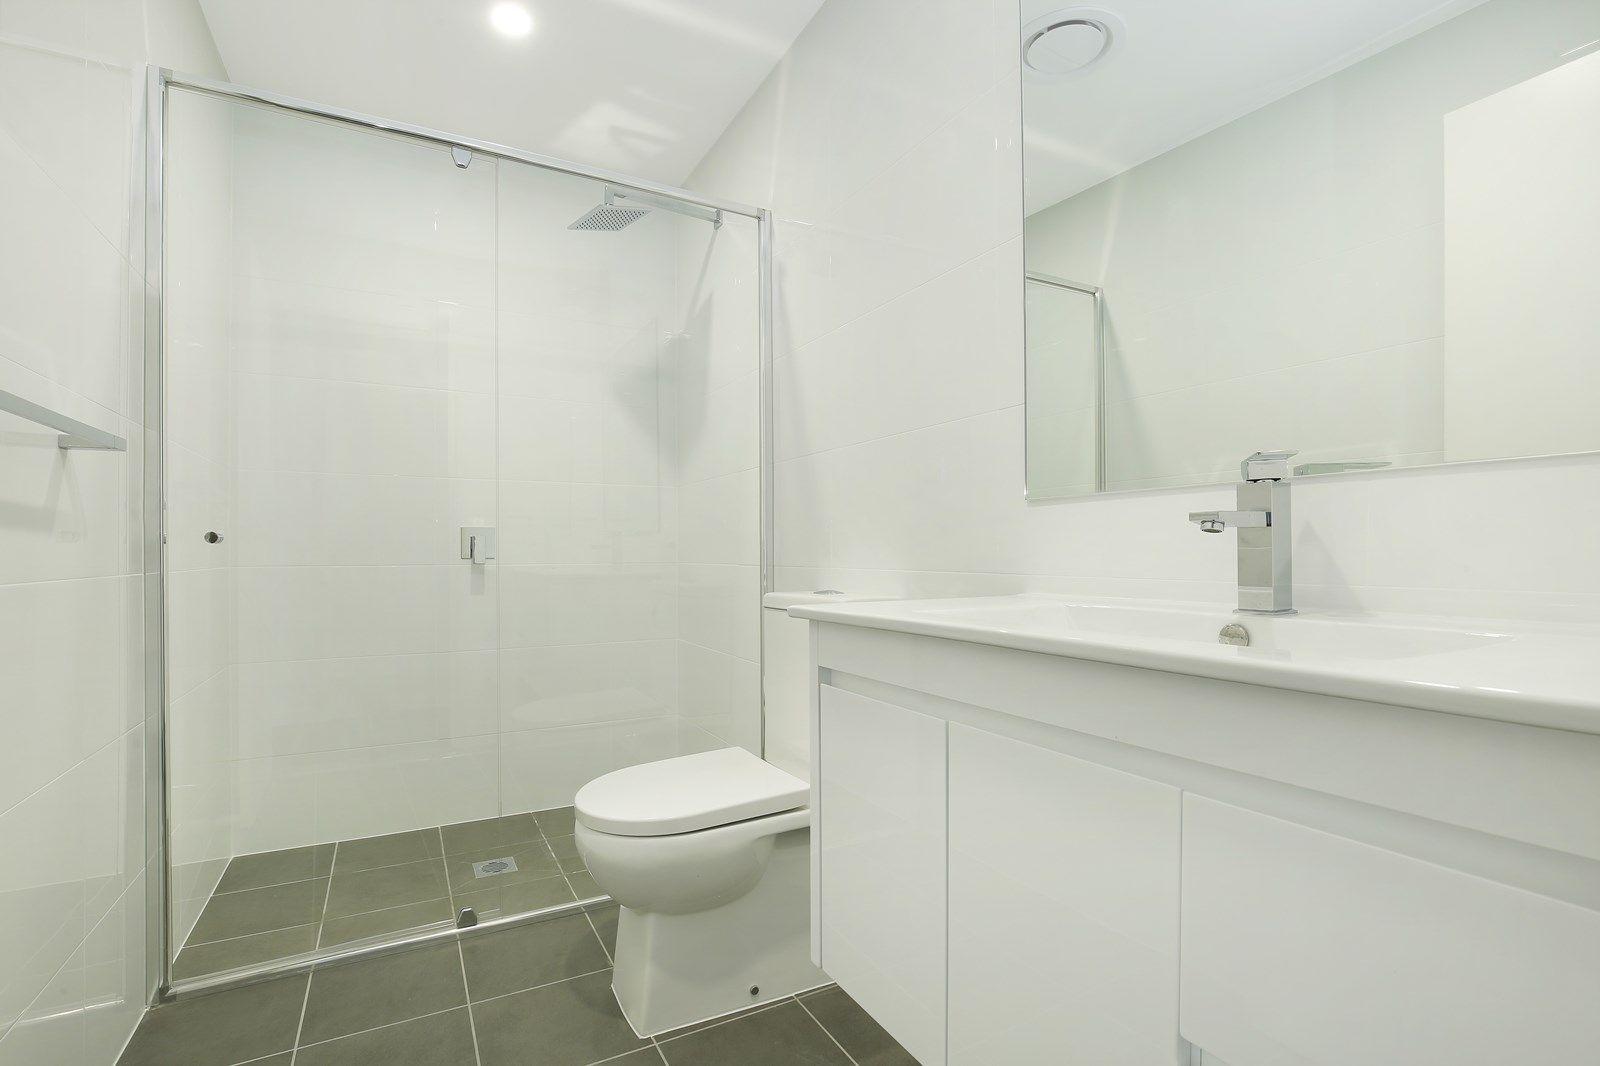 13/61 Keira  Street, Wollongong NSW 2500, Image 1